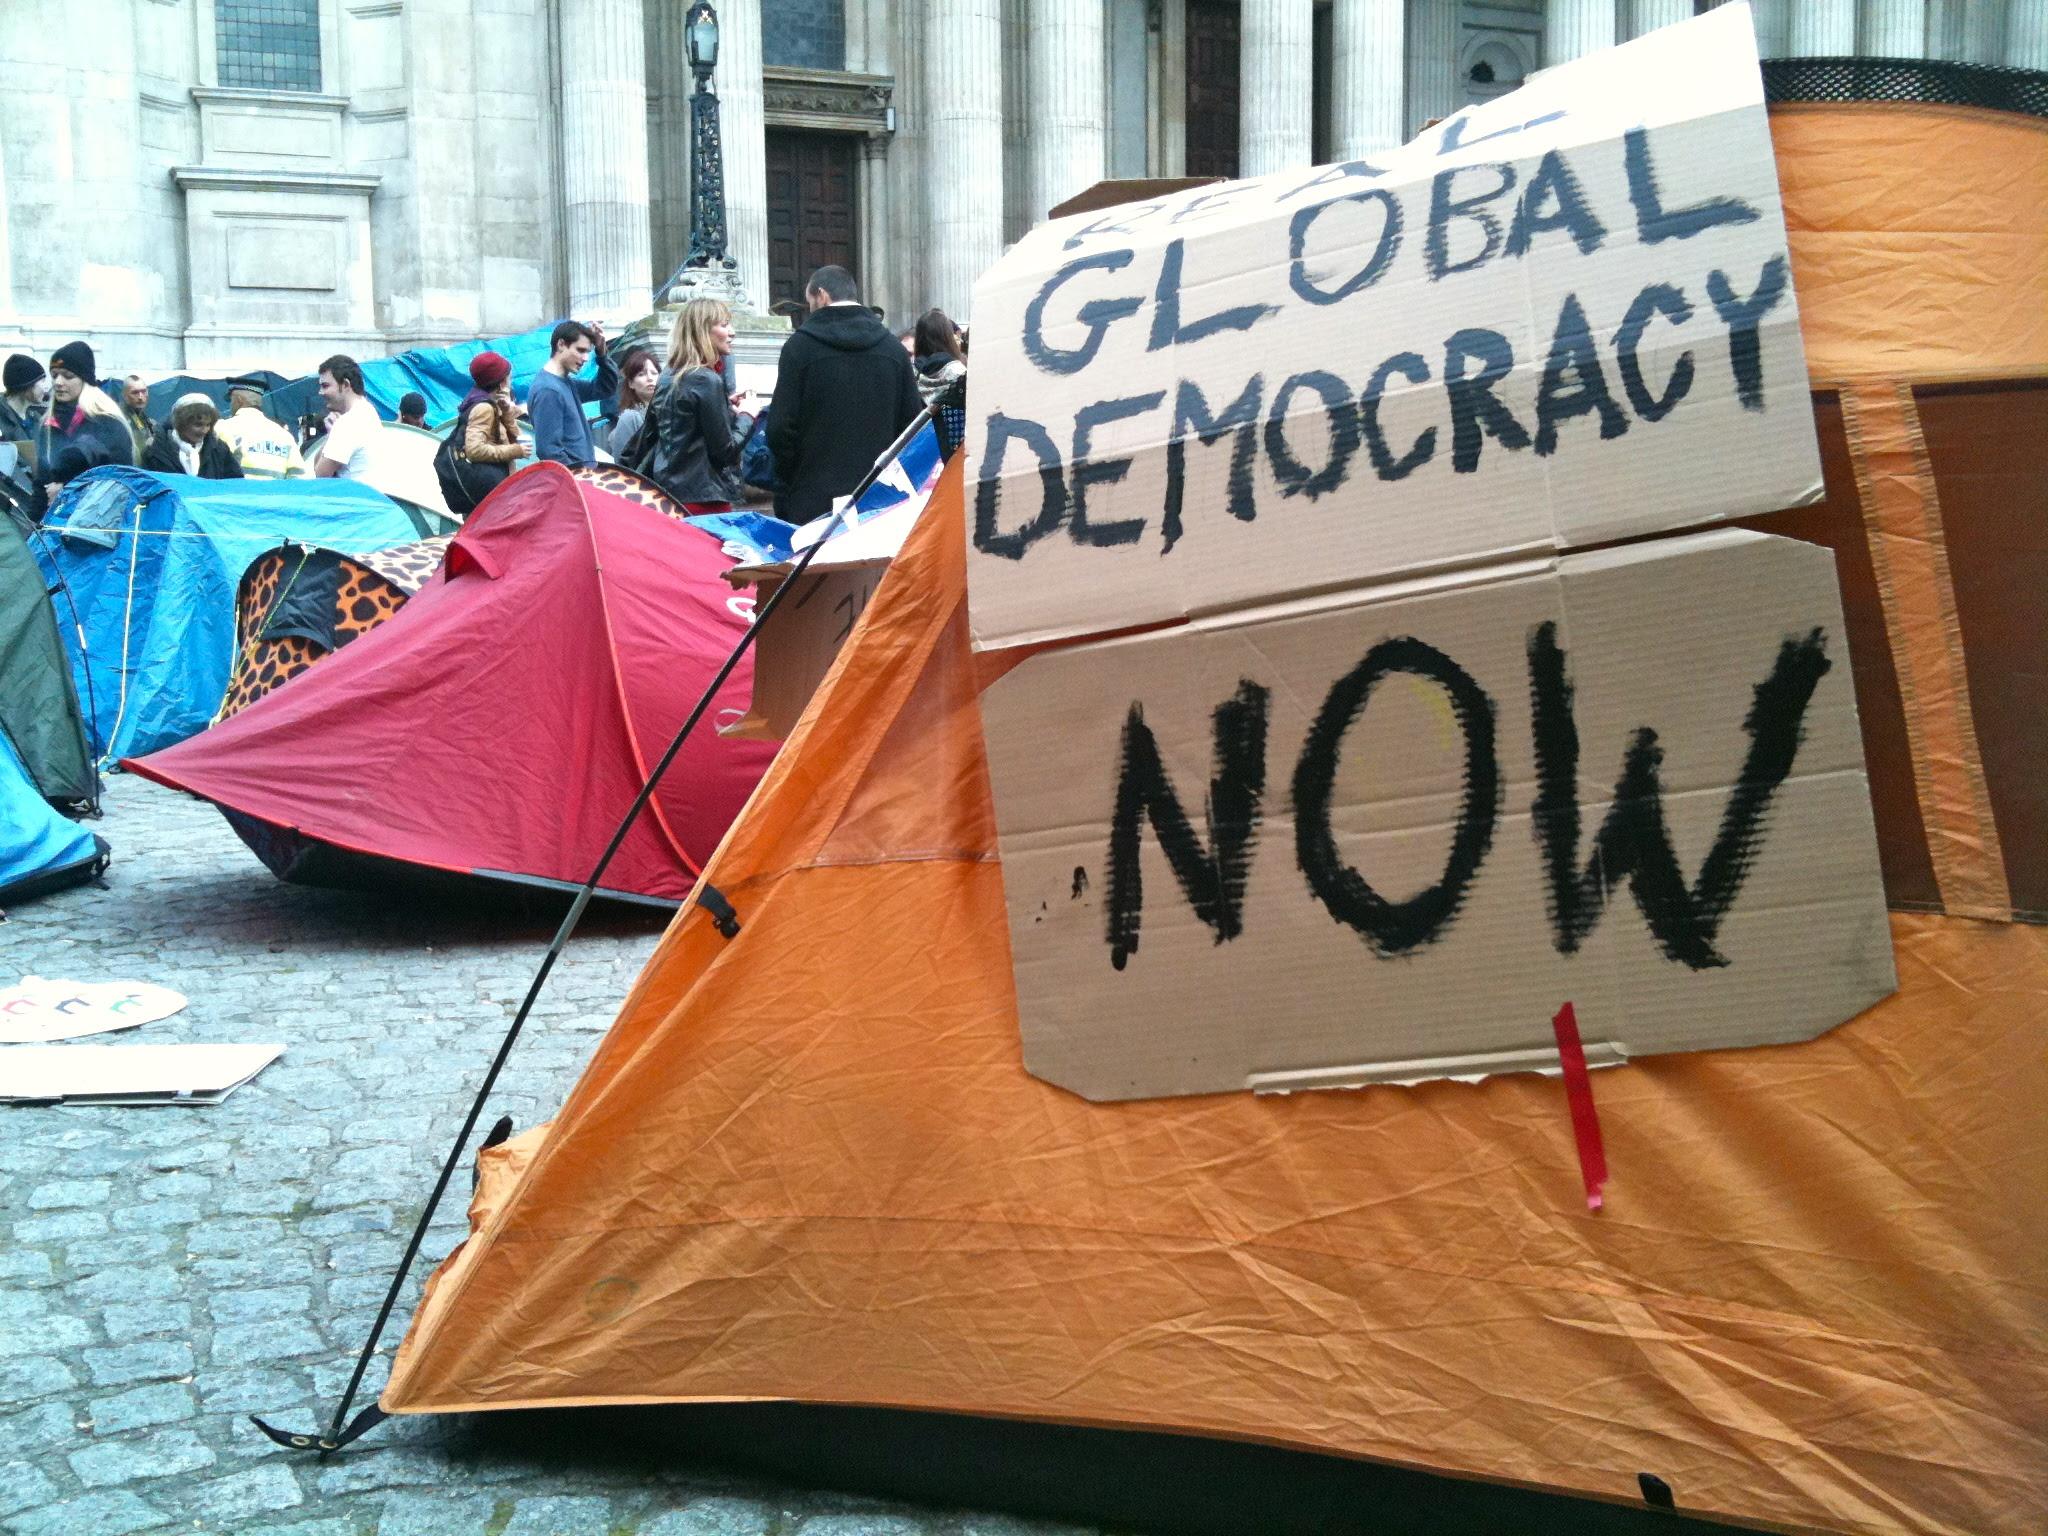 http://upload.wikimedia.org/wikipedia/commons/5/54/Occupy_London_Tent.jpg